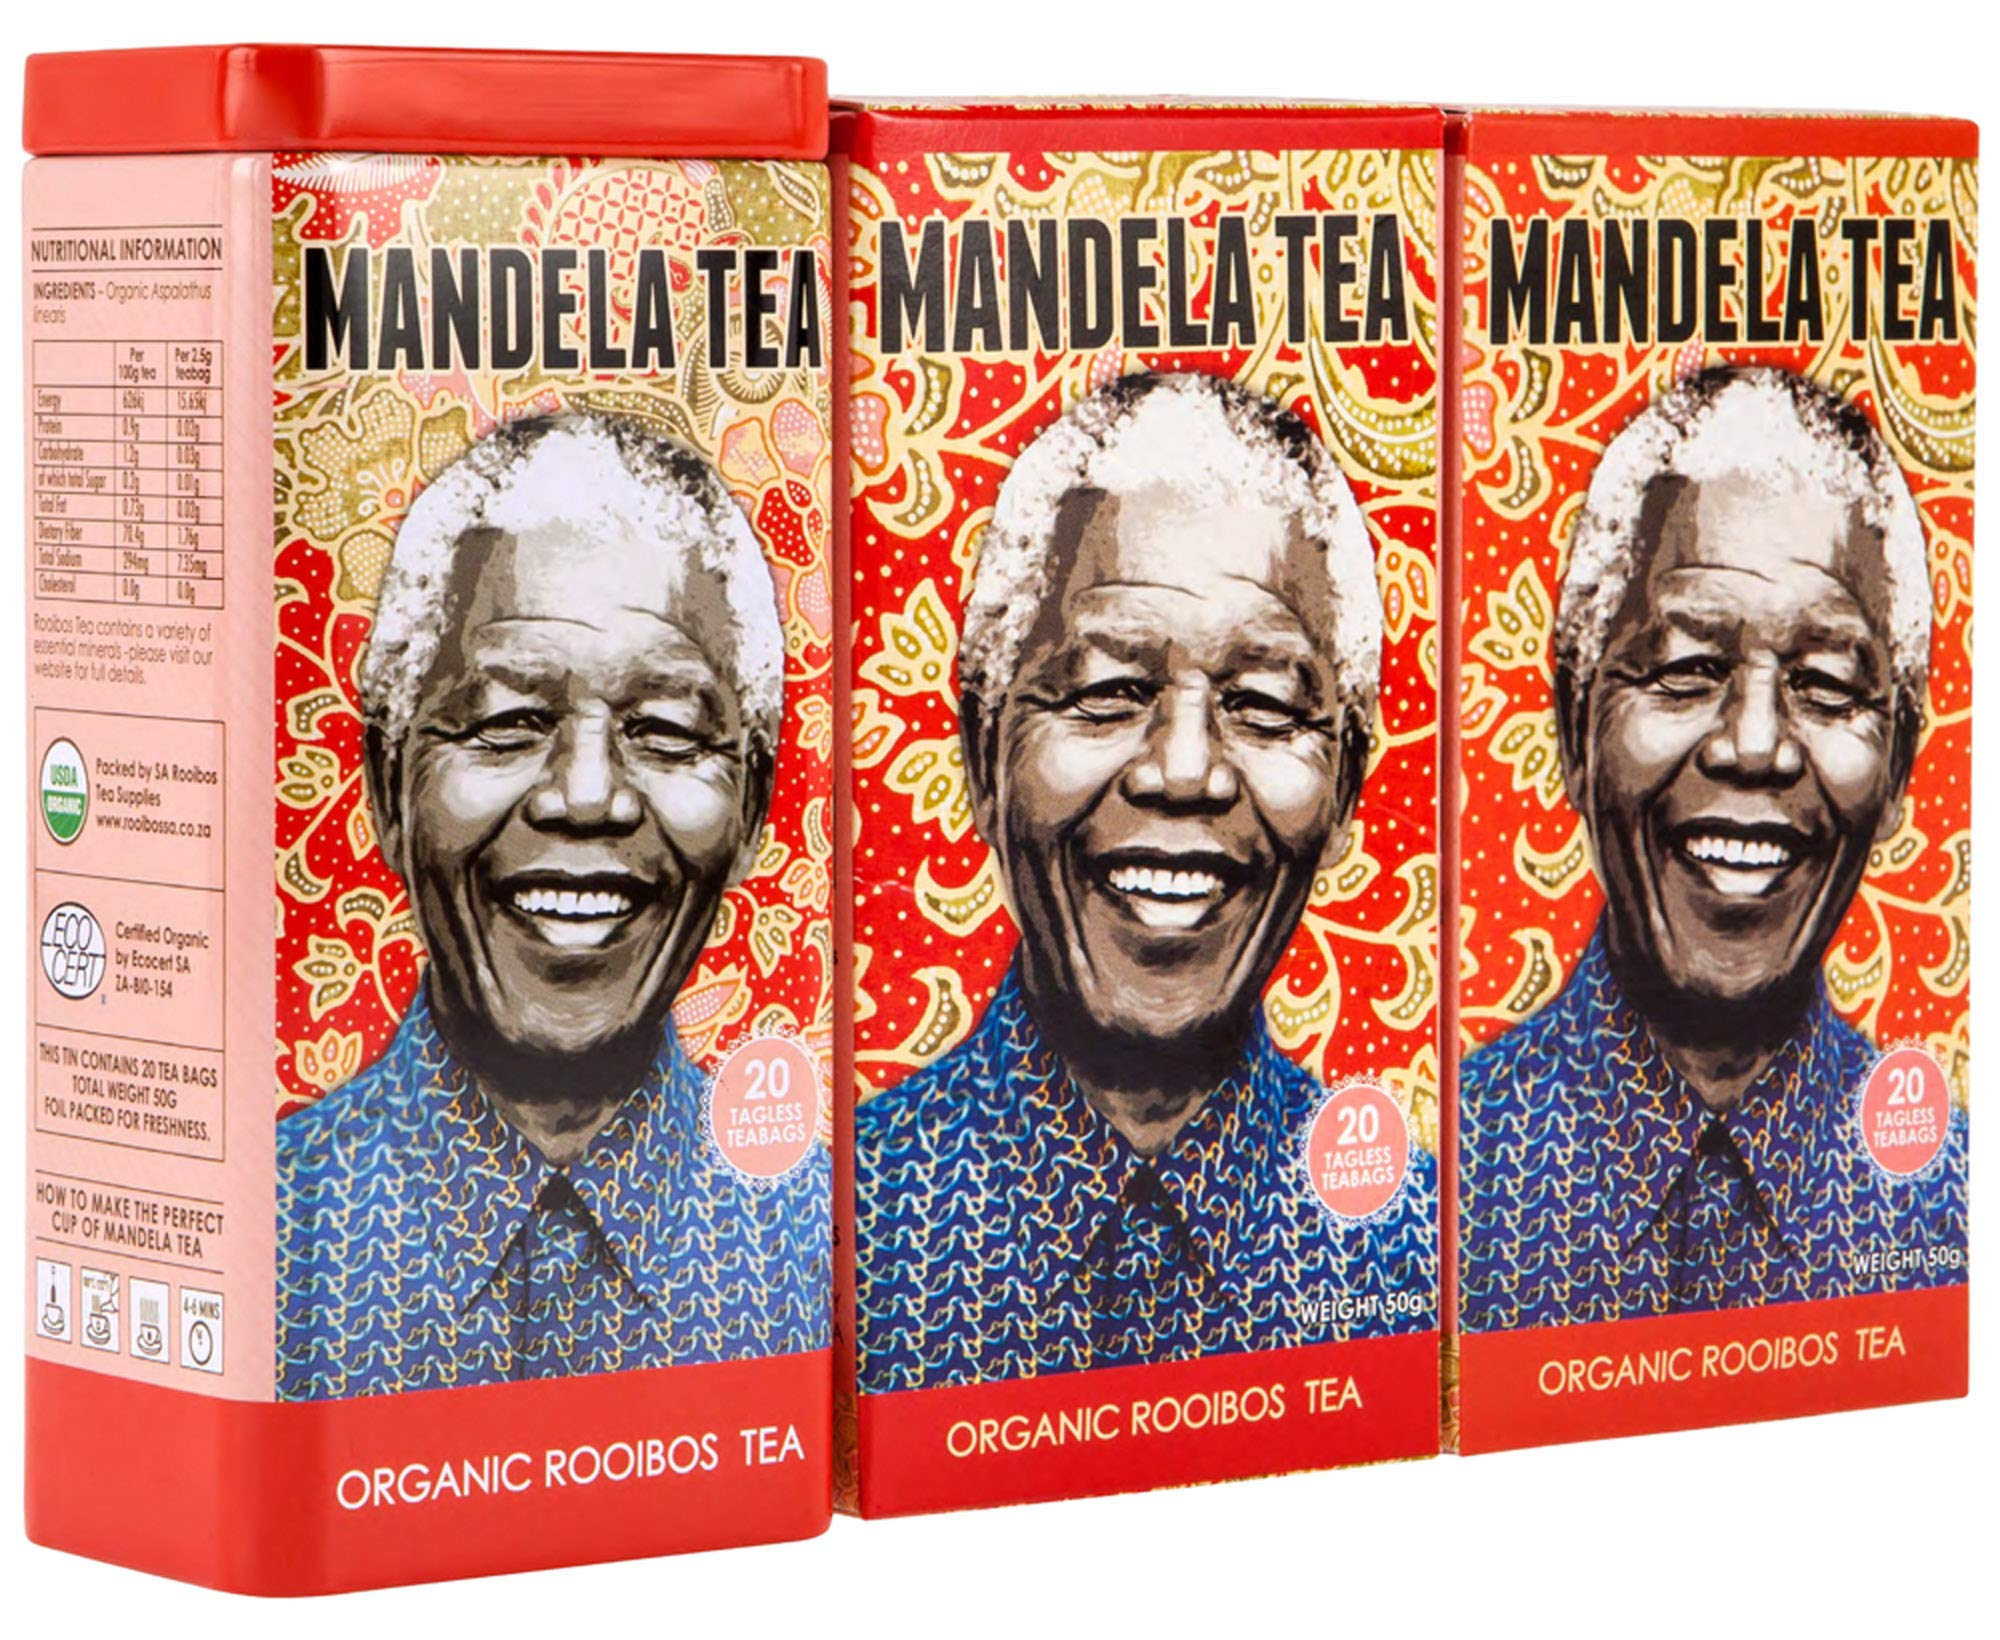 Mandela Tea - Organic Rooibos Tea (60 Tea Bags) | Delicious Organic Red Herbal Tea from South Africa | Includes Stay Fresh Gift Tin | Zero Calorie or Caffeine | Antioxidant Rich All Natural Tea Leaves